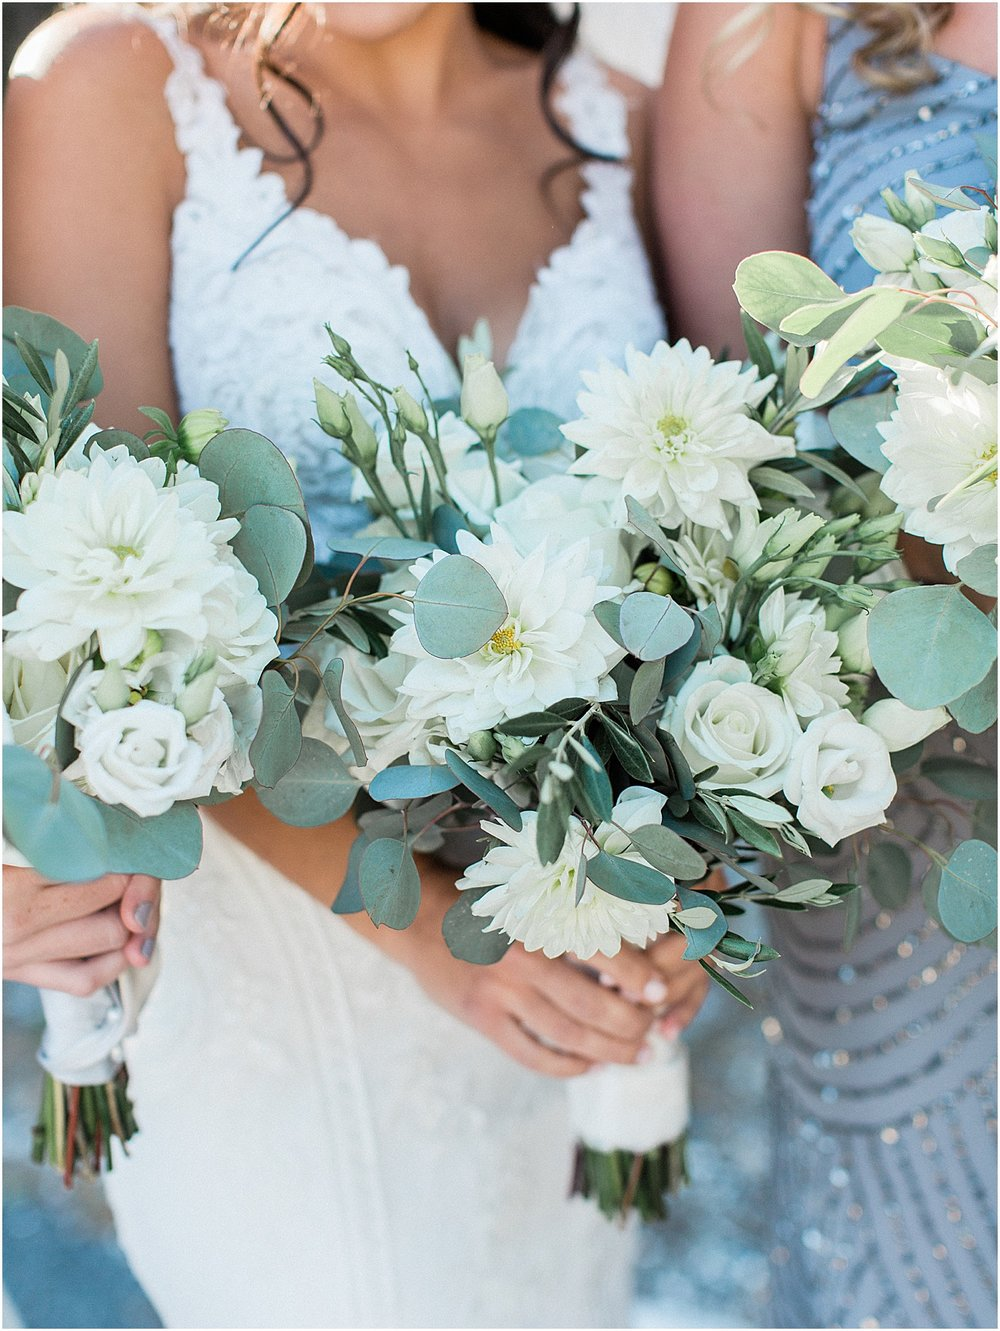 michelle_matt_popponesset_inn_celebrations_new_seabury_fall_cape_cod_boston_wedding_photographer_meredith_jane_photography_photo_1562.jpg